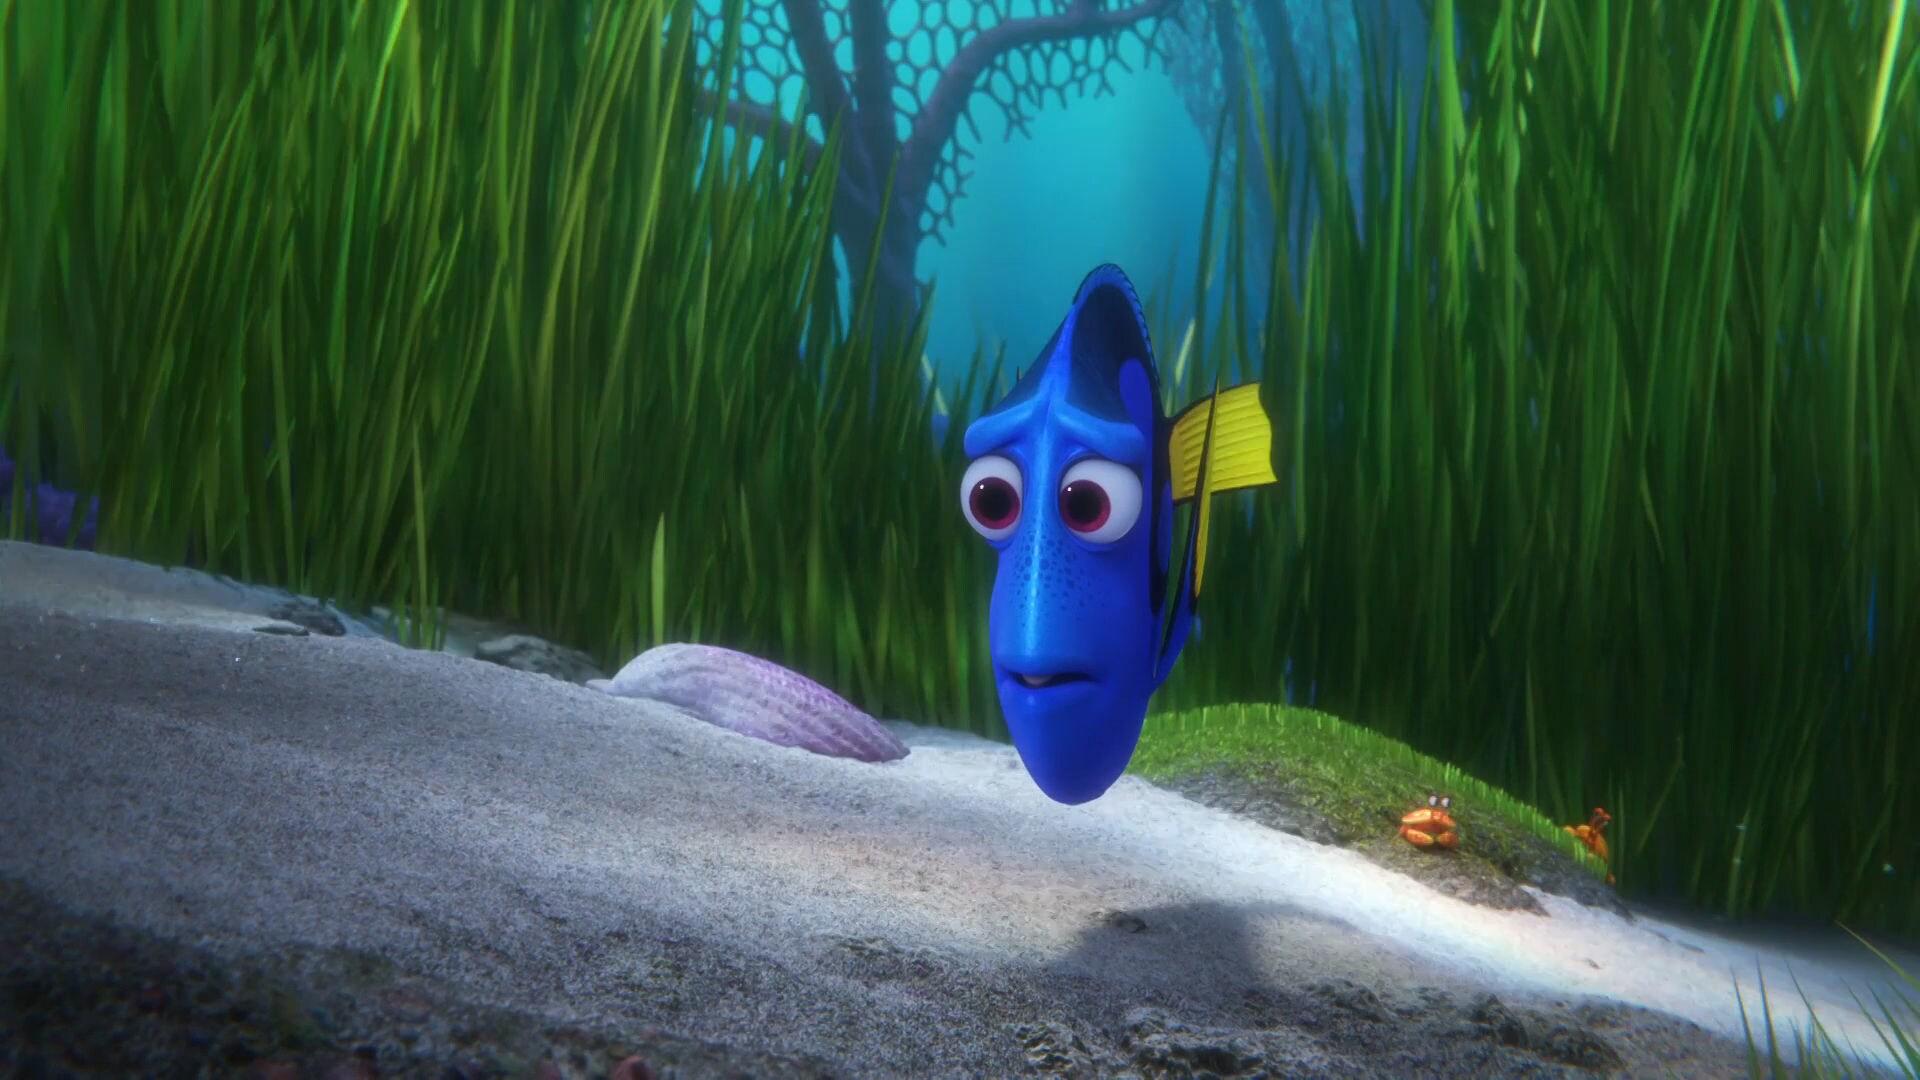 Disney•Pixar's Finding Dory